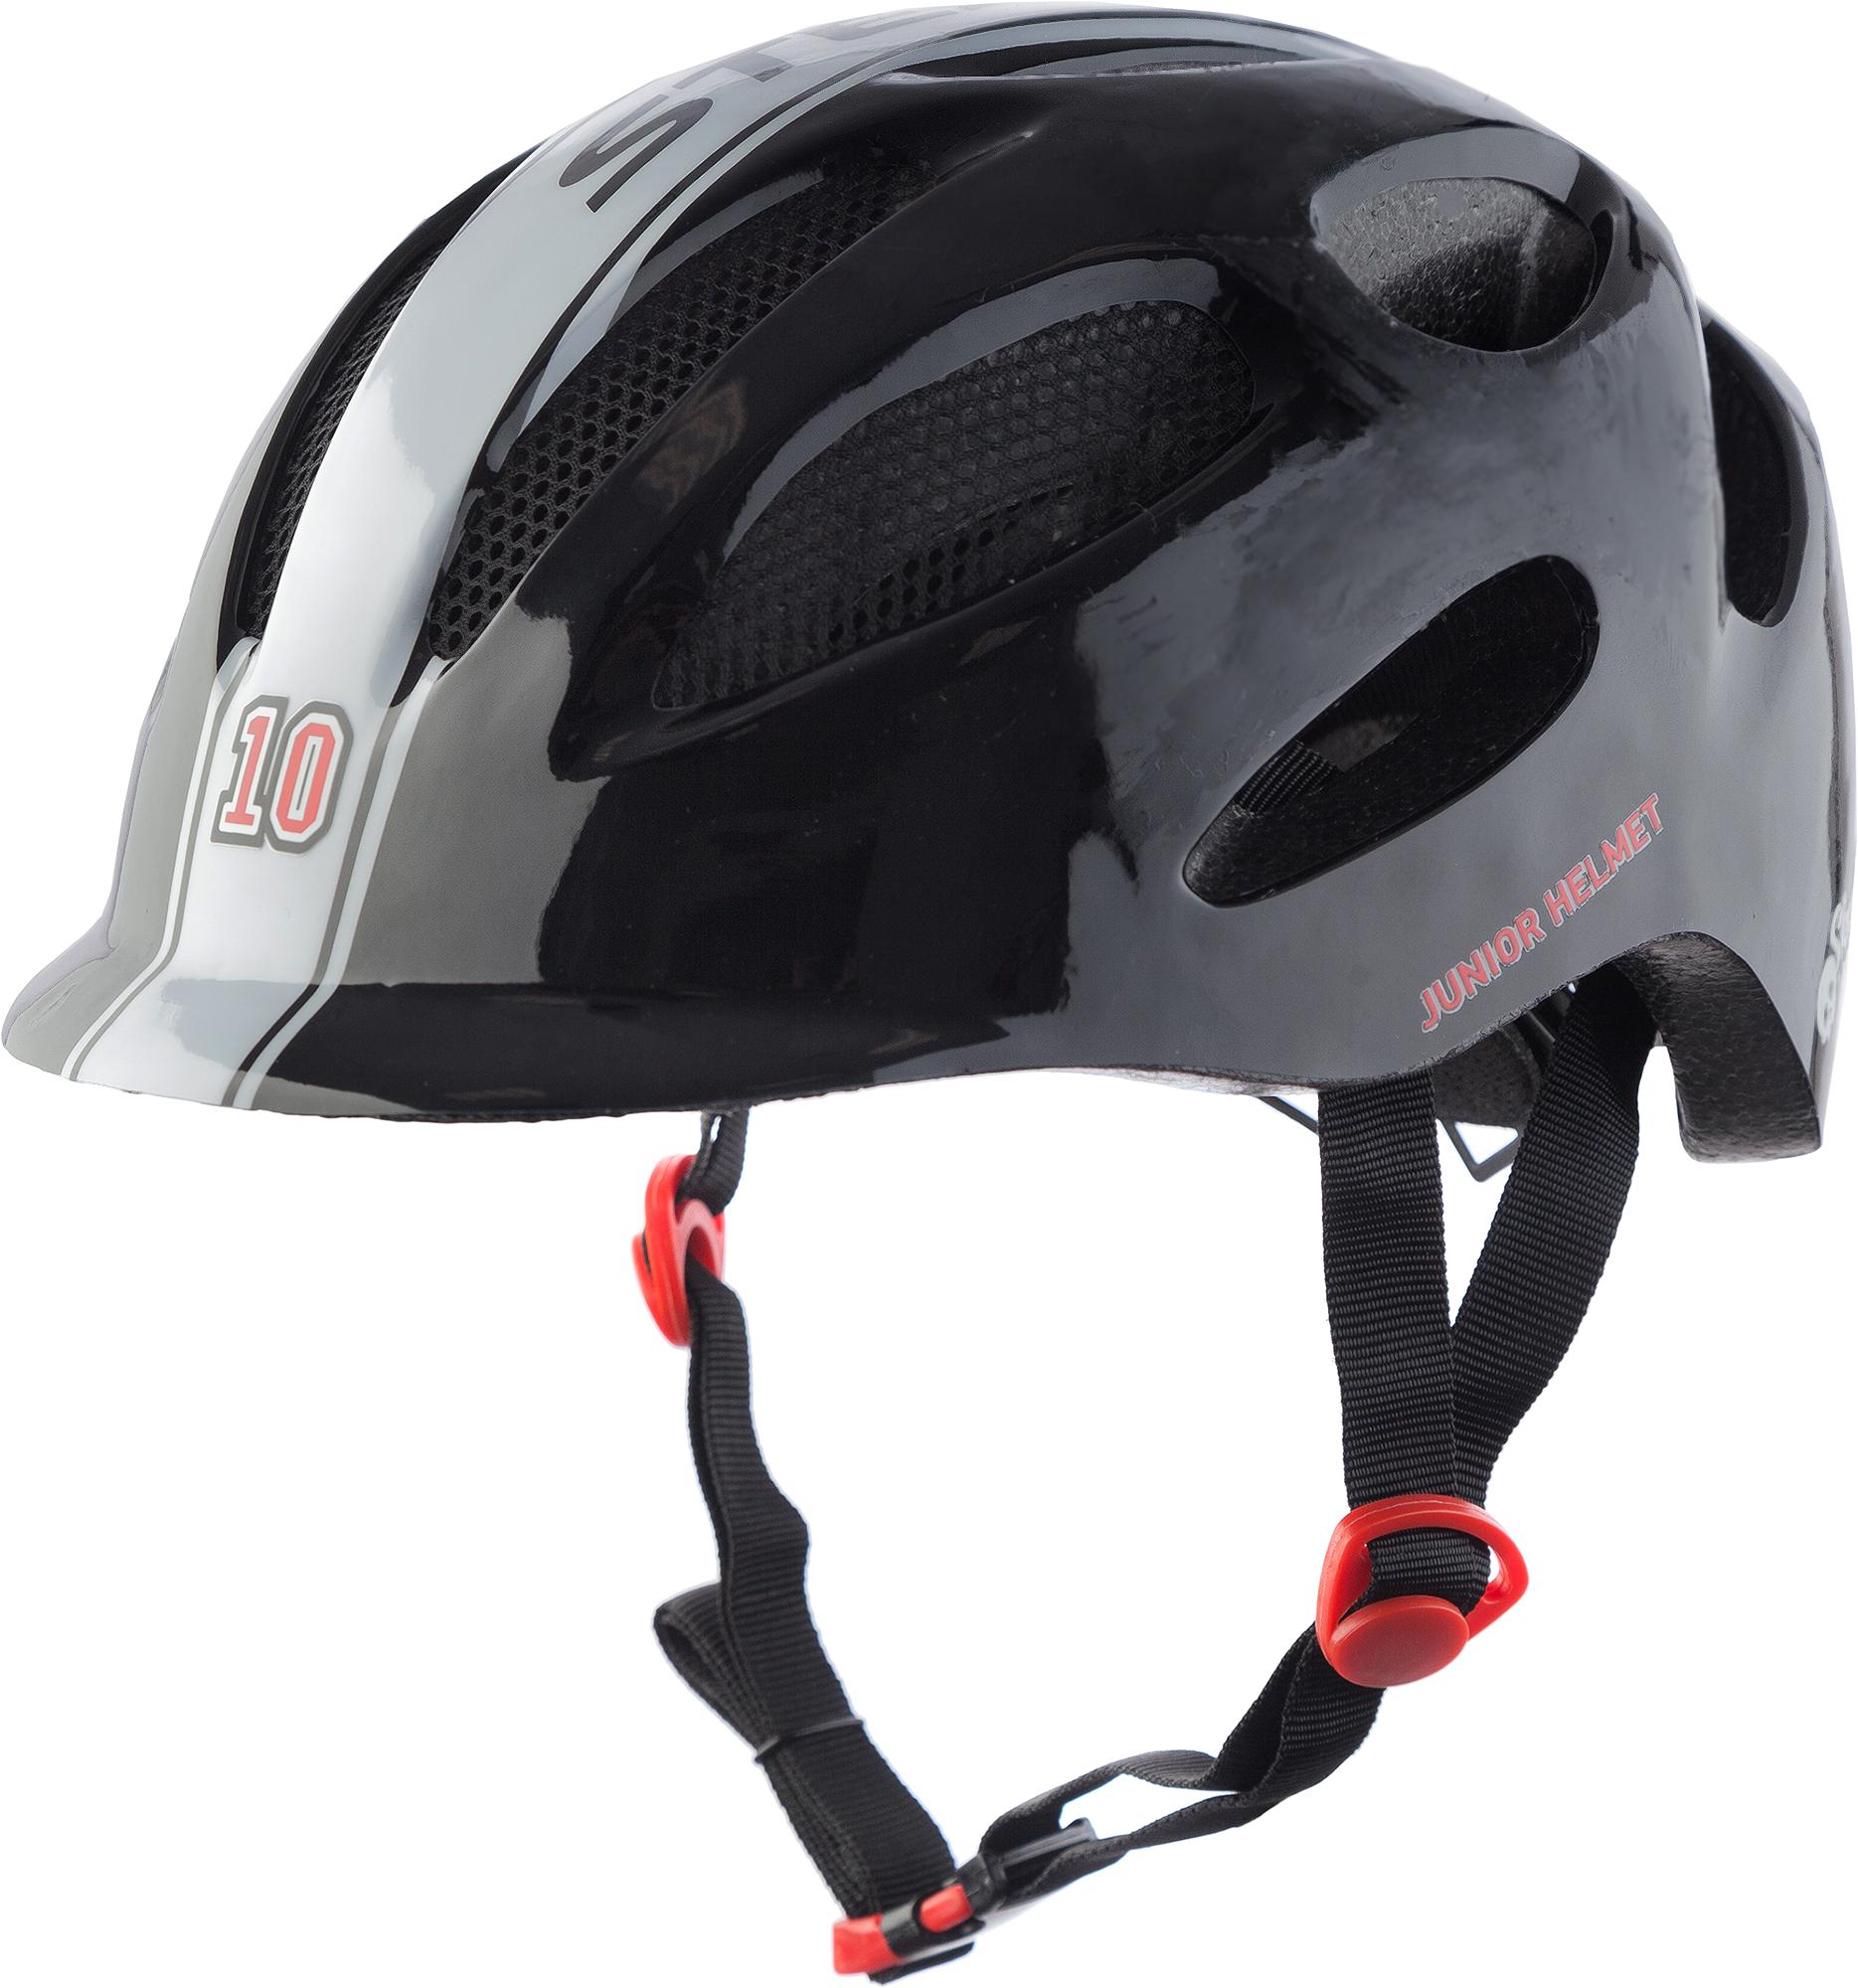 Stern Шлем велосипедный детский Stern